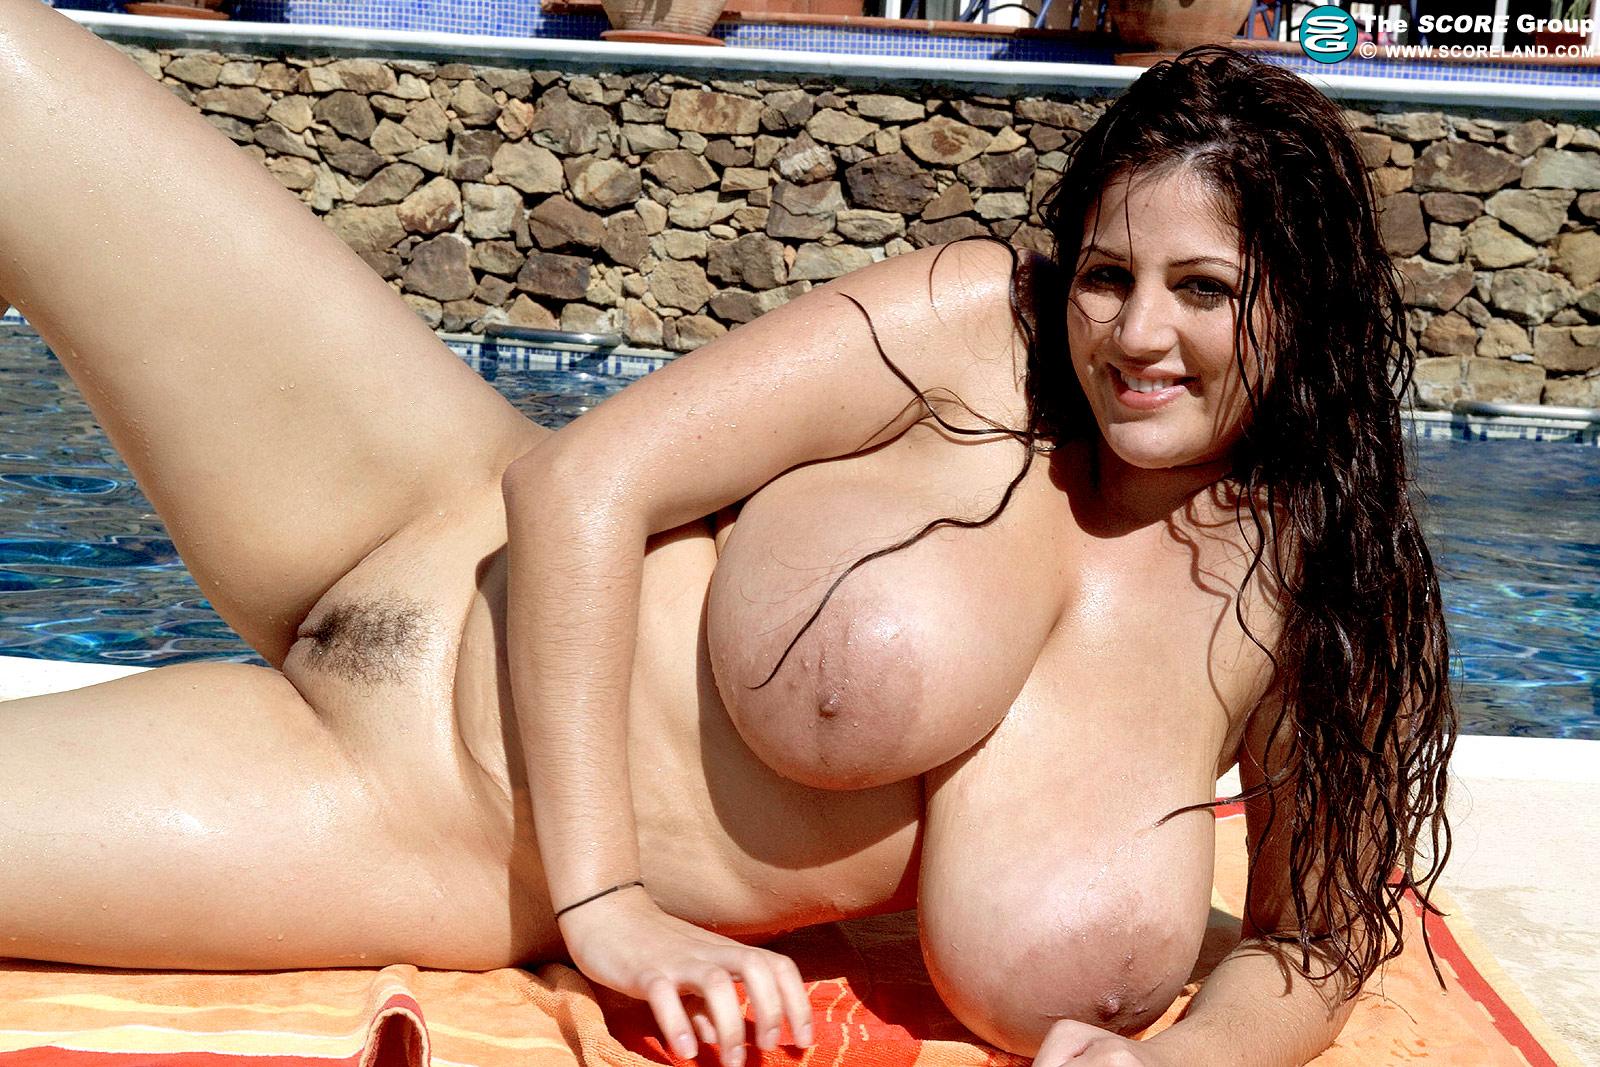 Eden mor boobs paradise free xnxx pics porn galeries